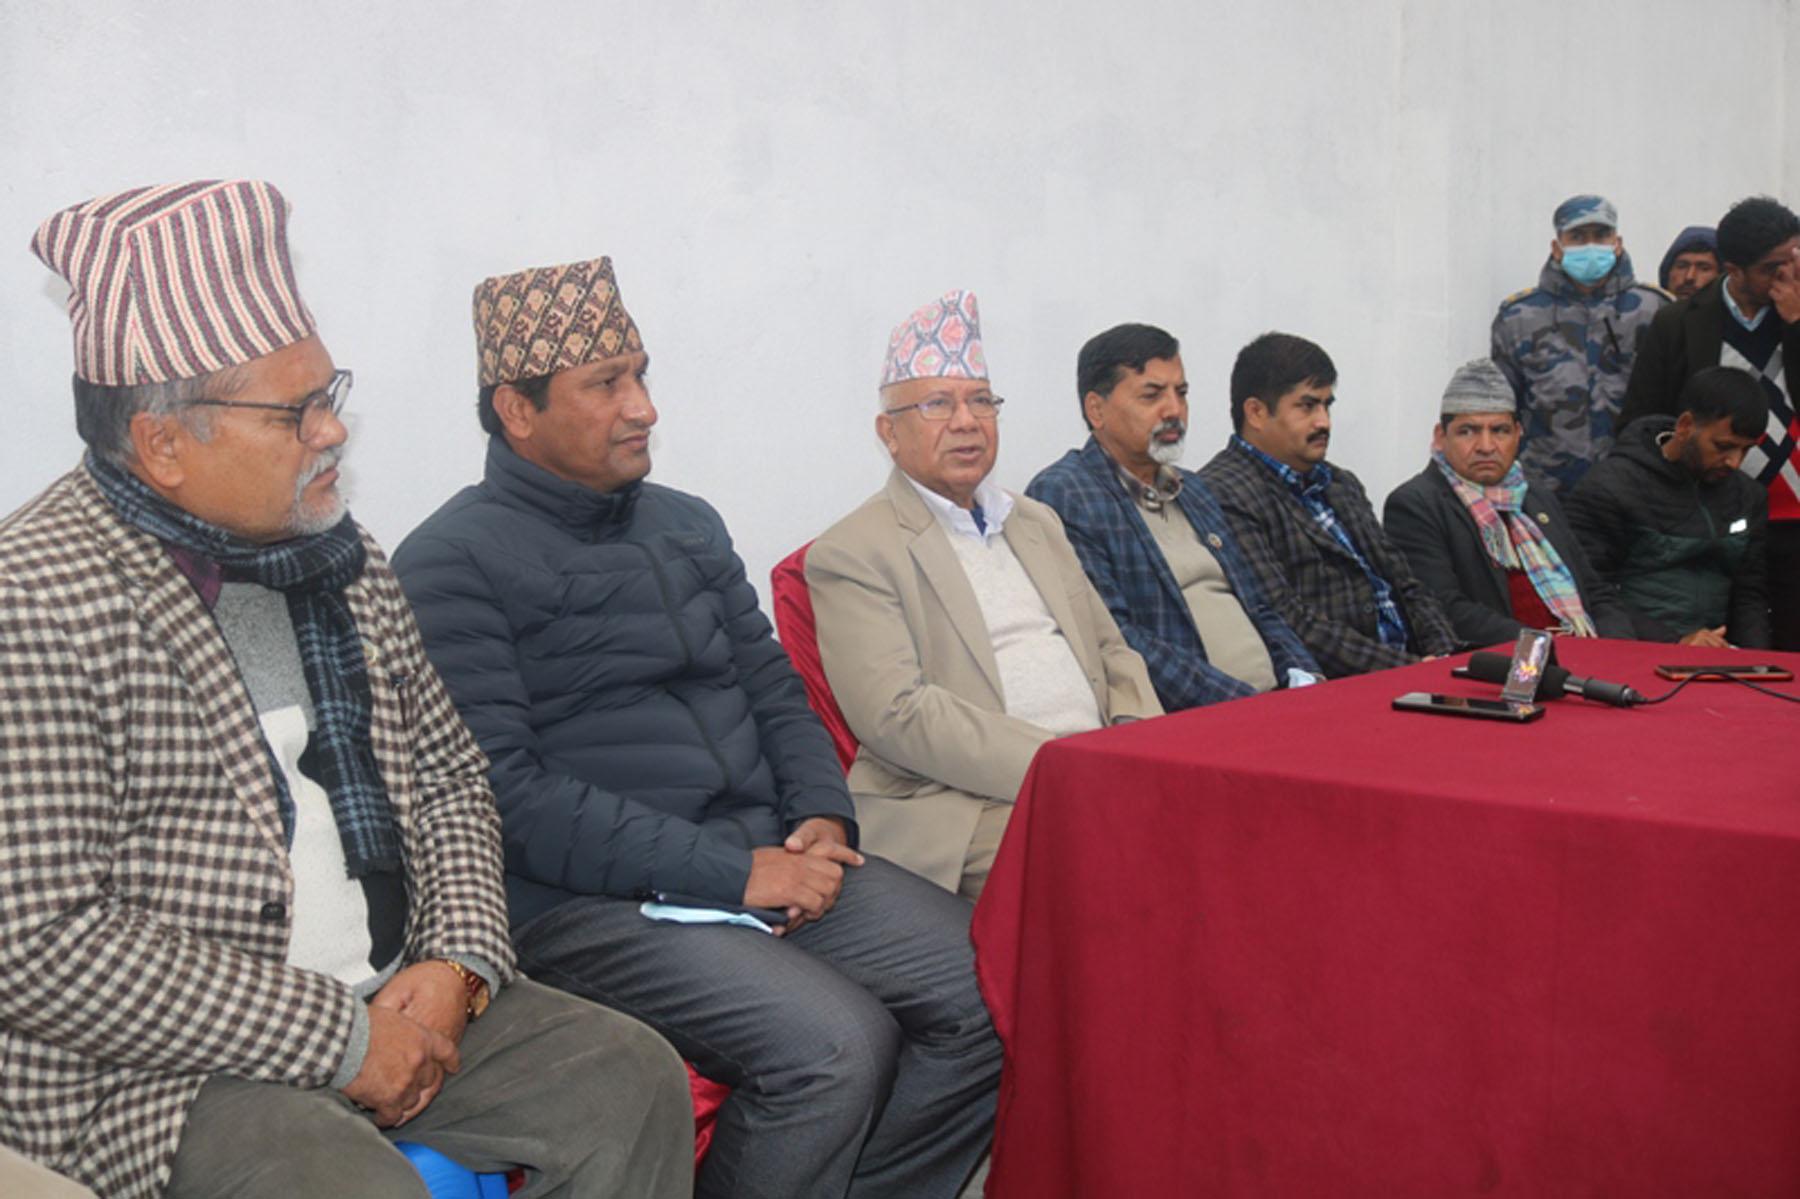 कर्णाली जाग्दा देश जाग्छ : अध्यक्ष नेपाल